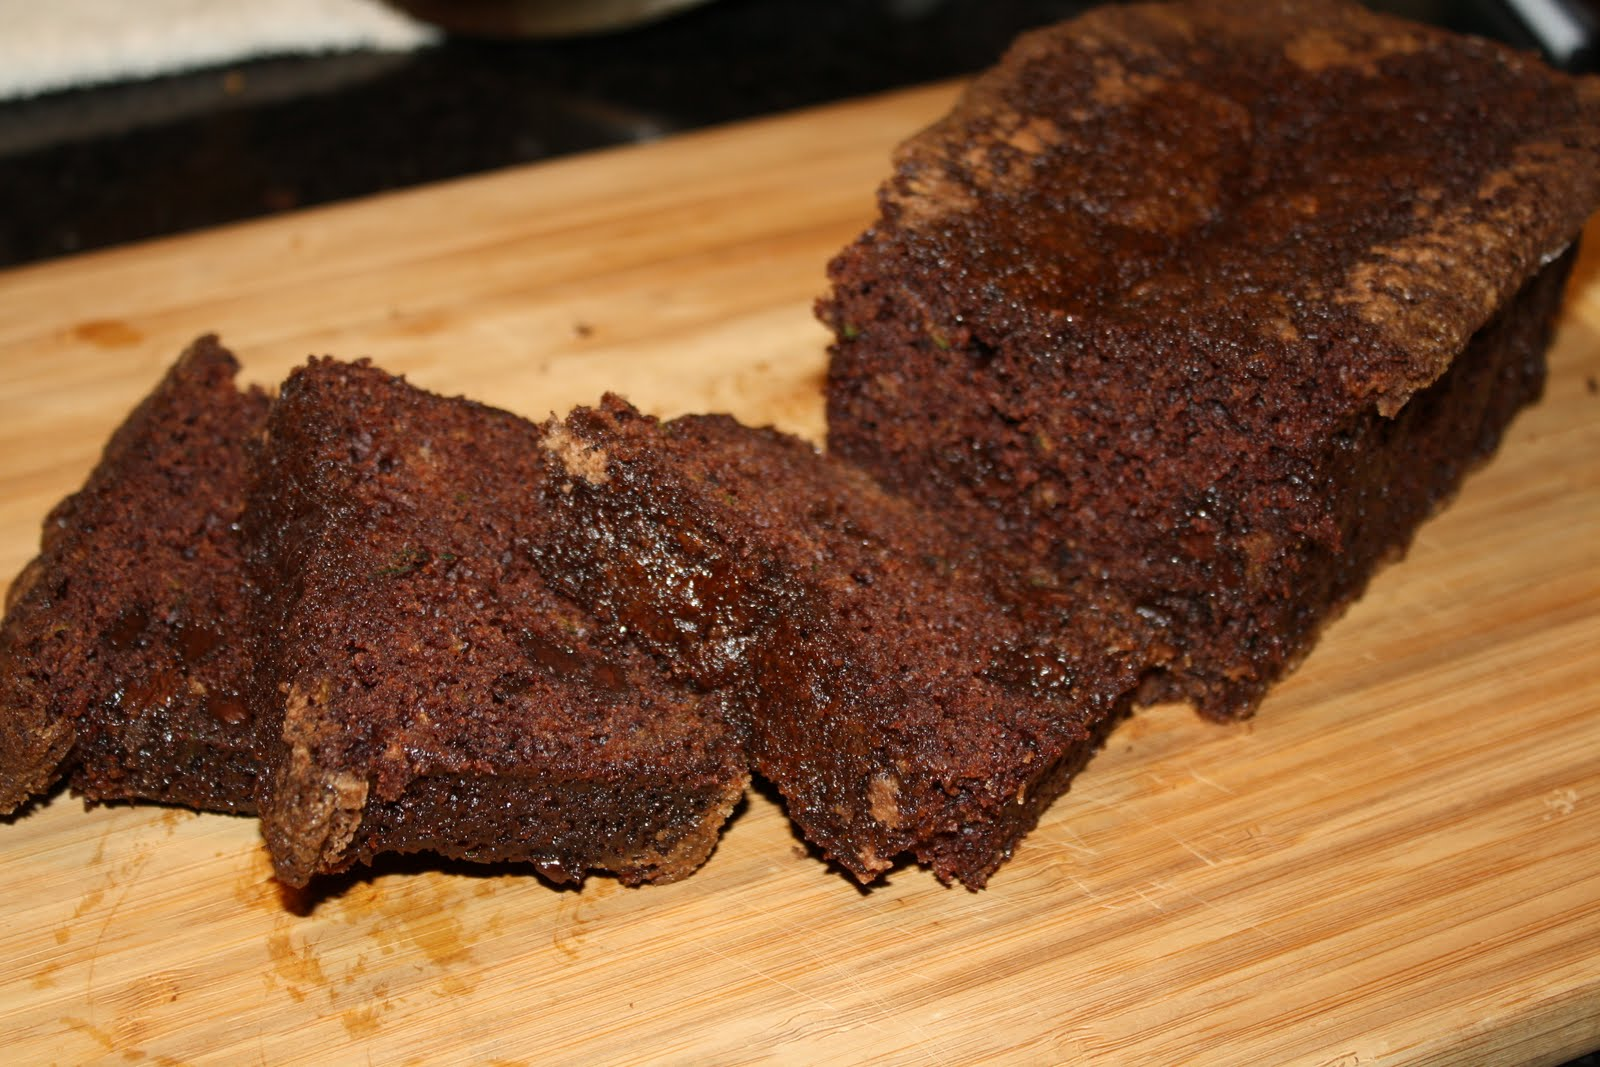 Seasoned with Love: Double Chocolate Zucchini Bread